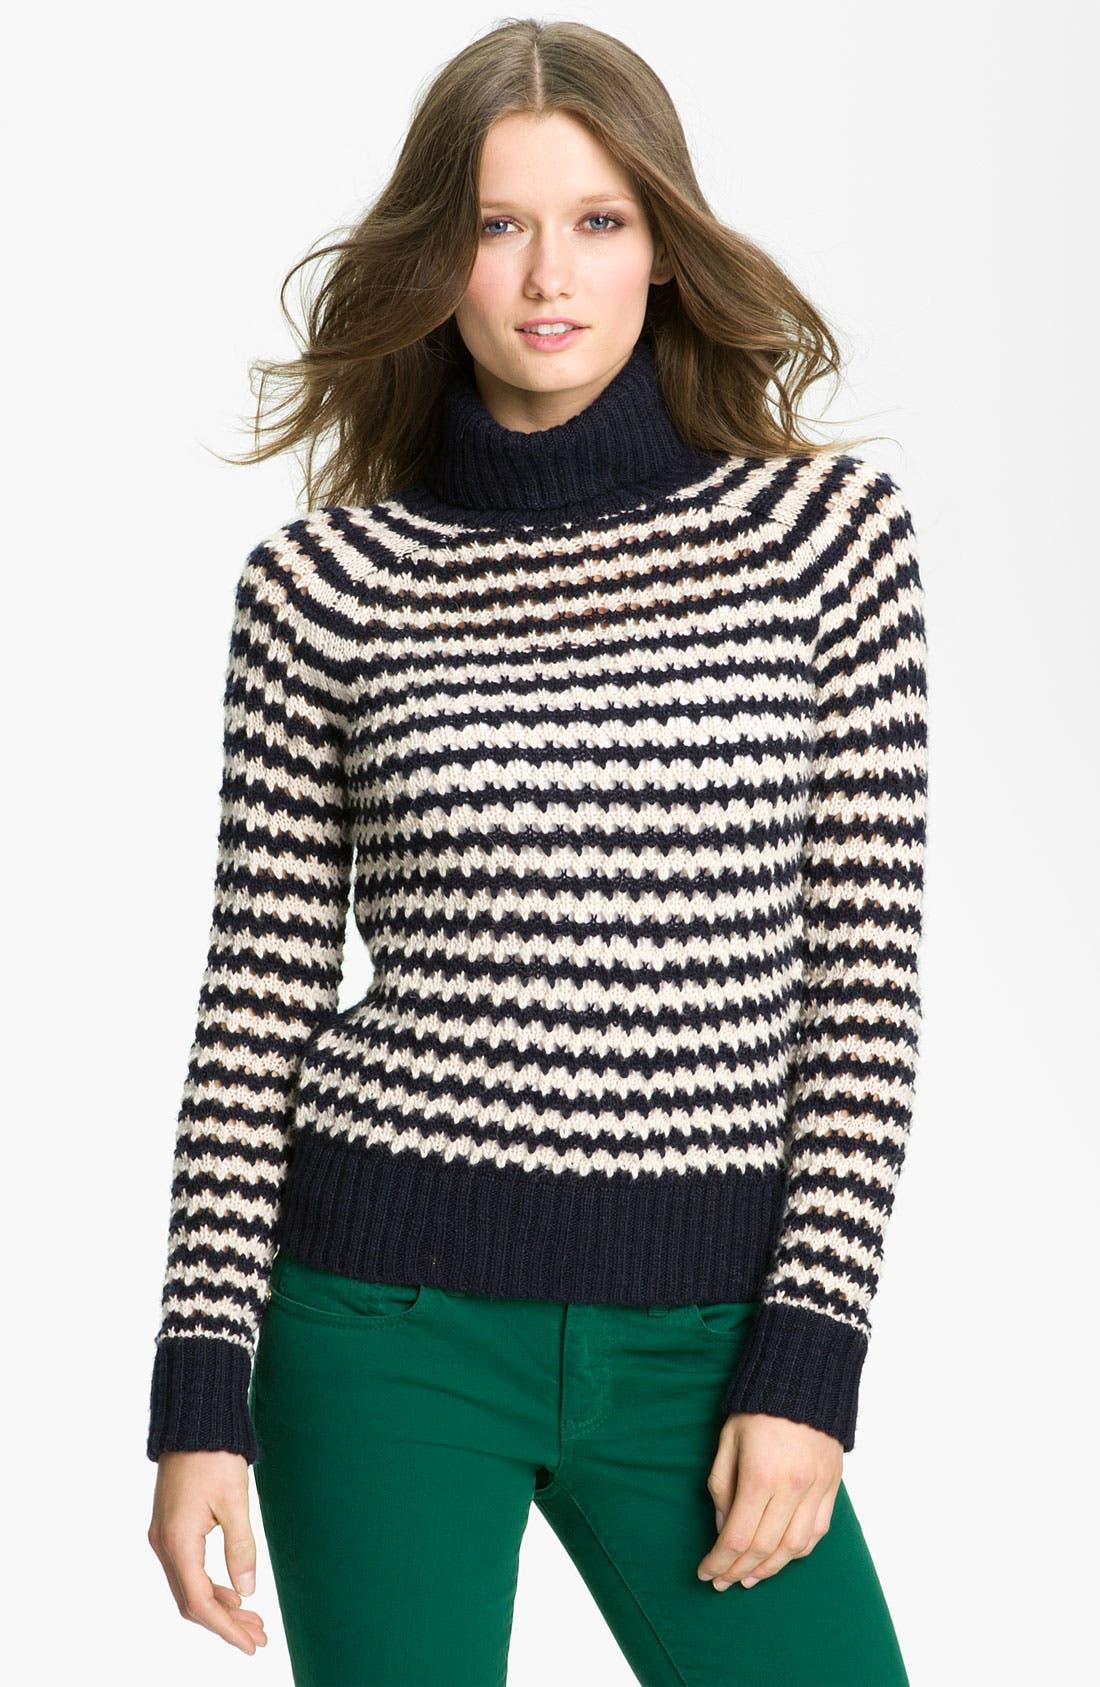 Alternate Image 1 Selected - Tory Burch 'Carey' Turtleneck Sweater